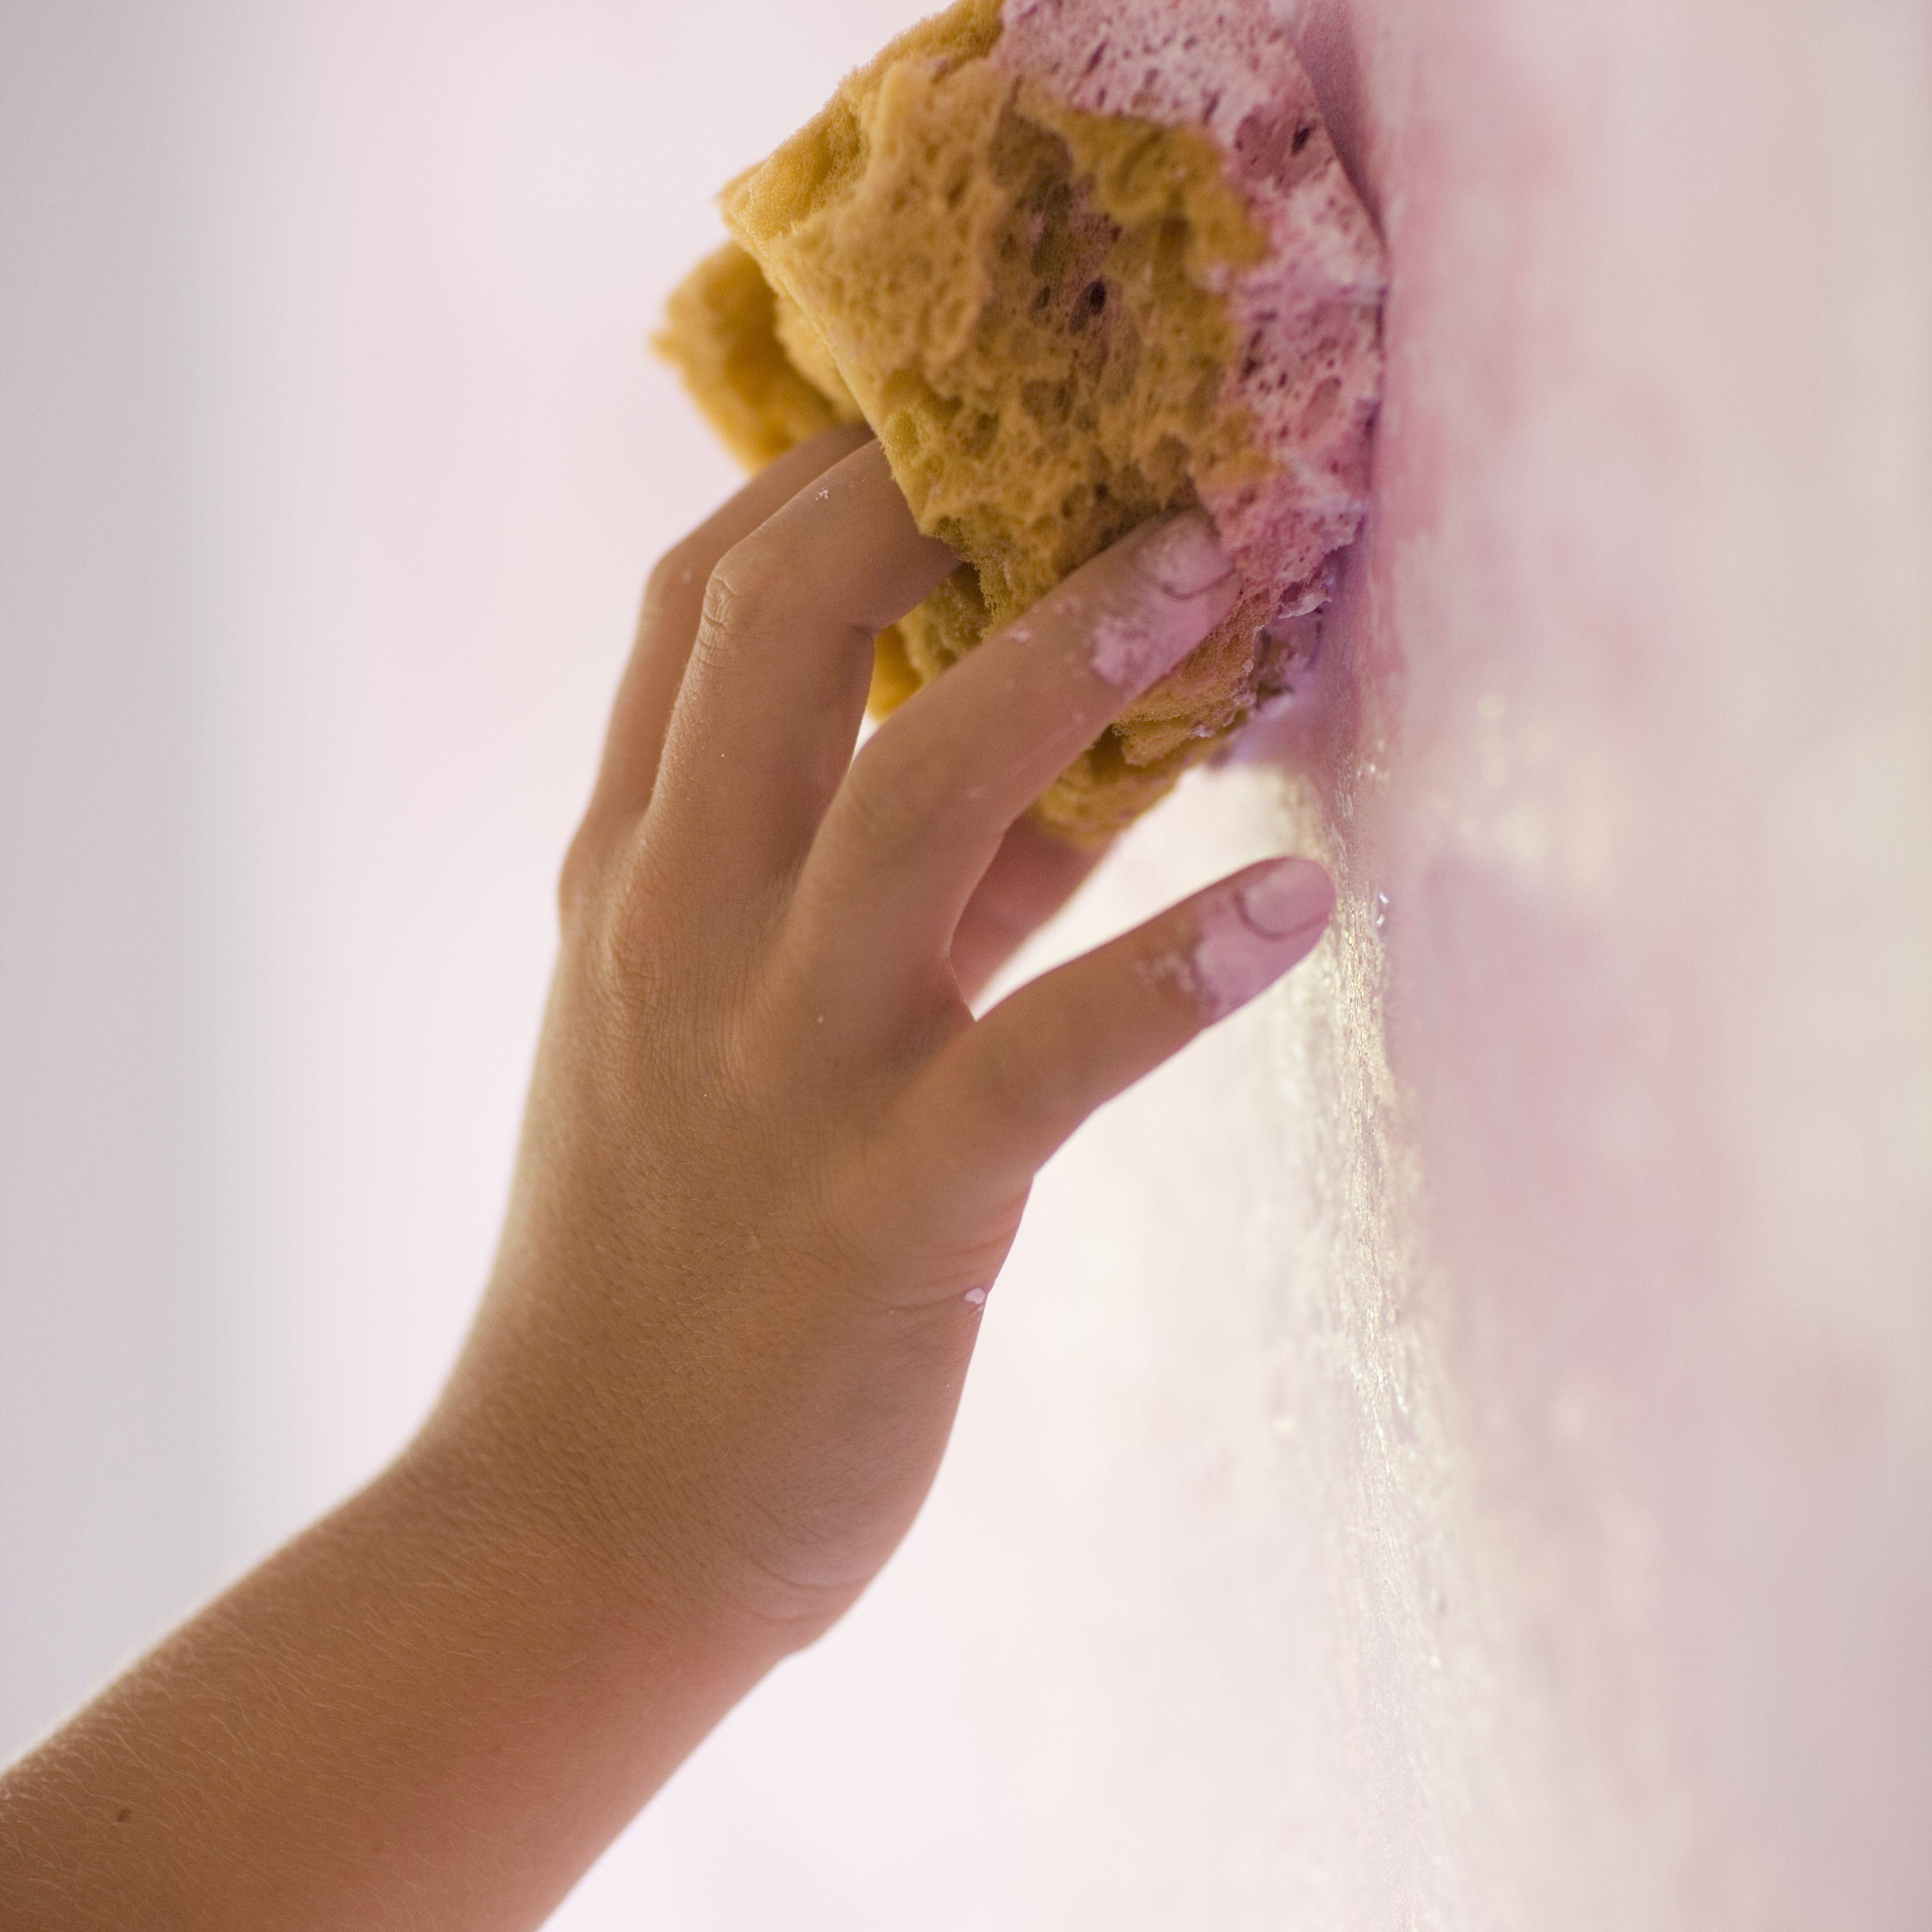 How To Sponge Paint A Room